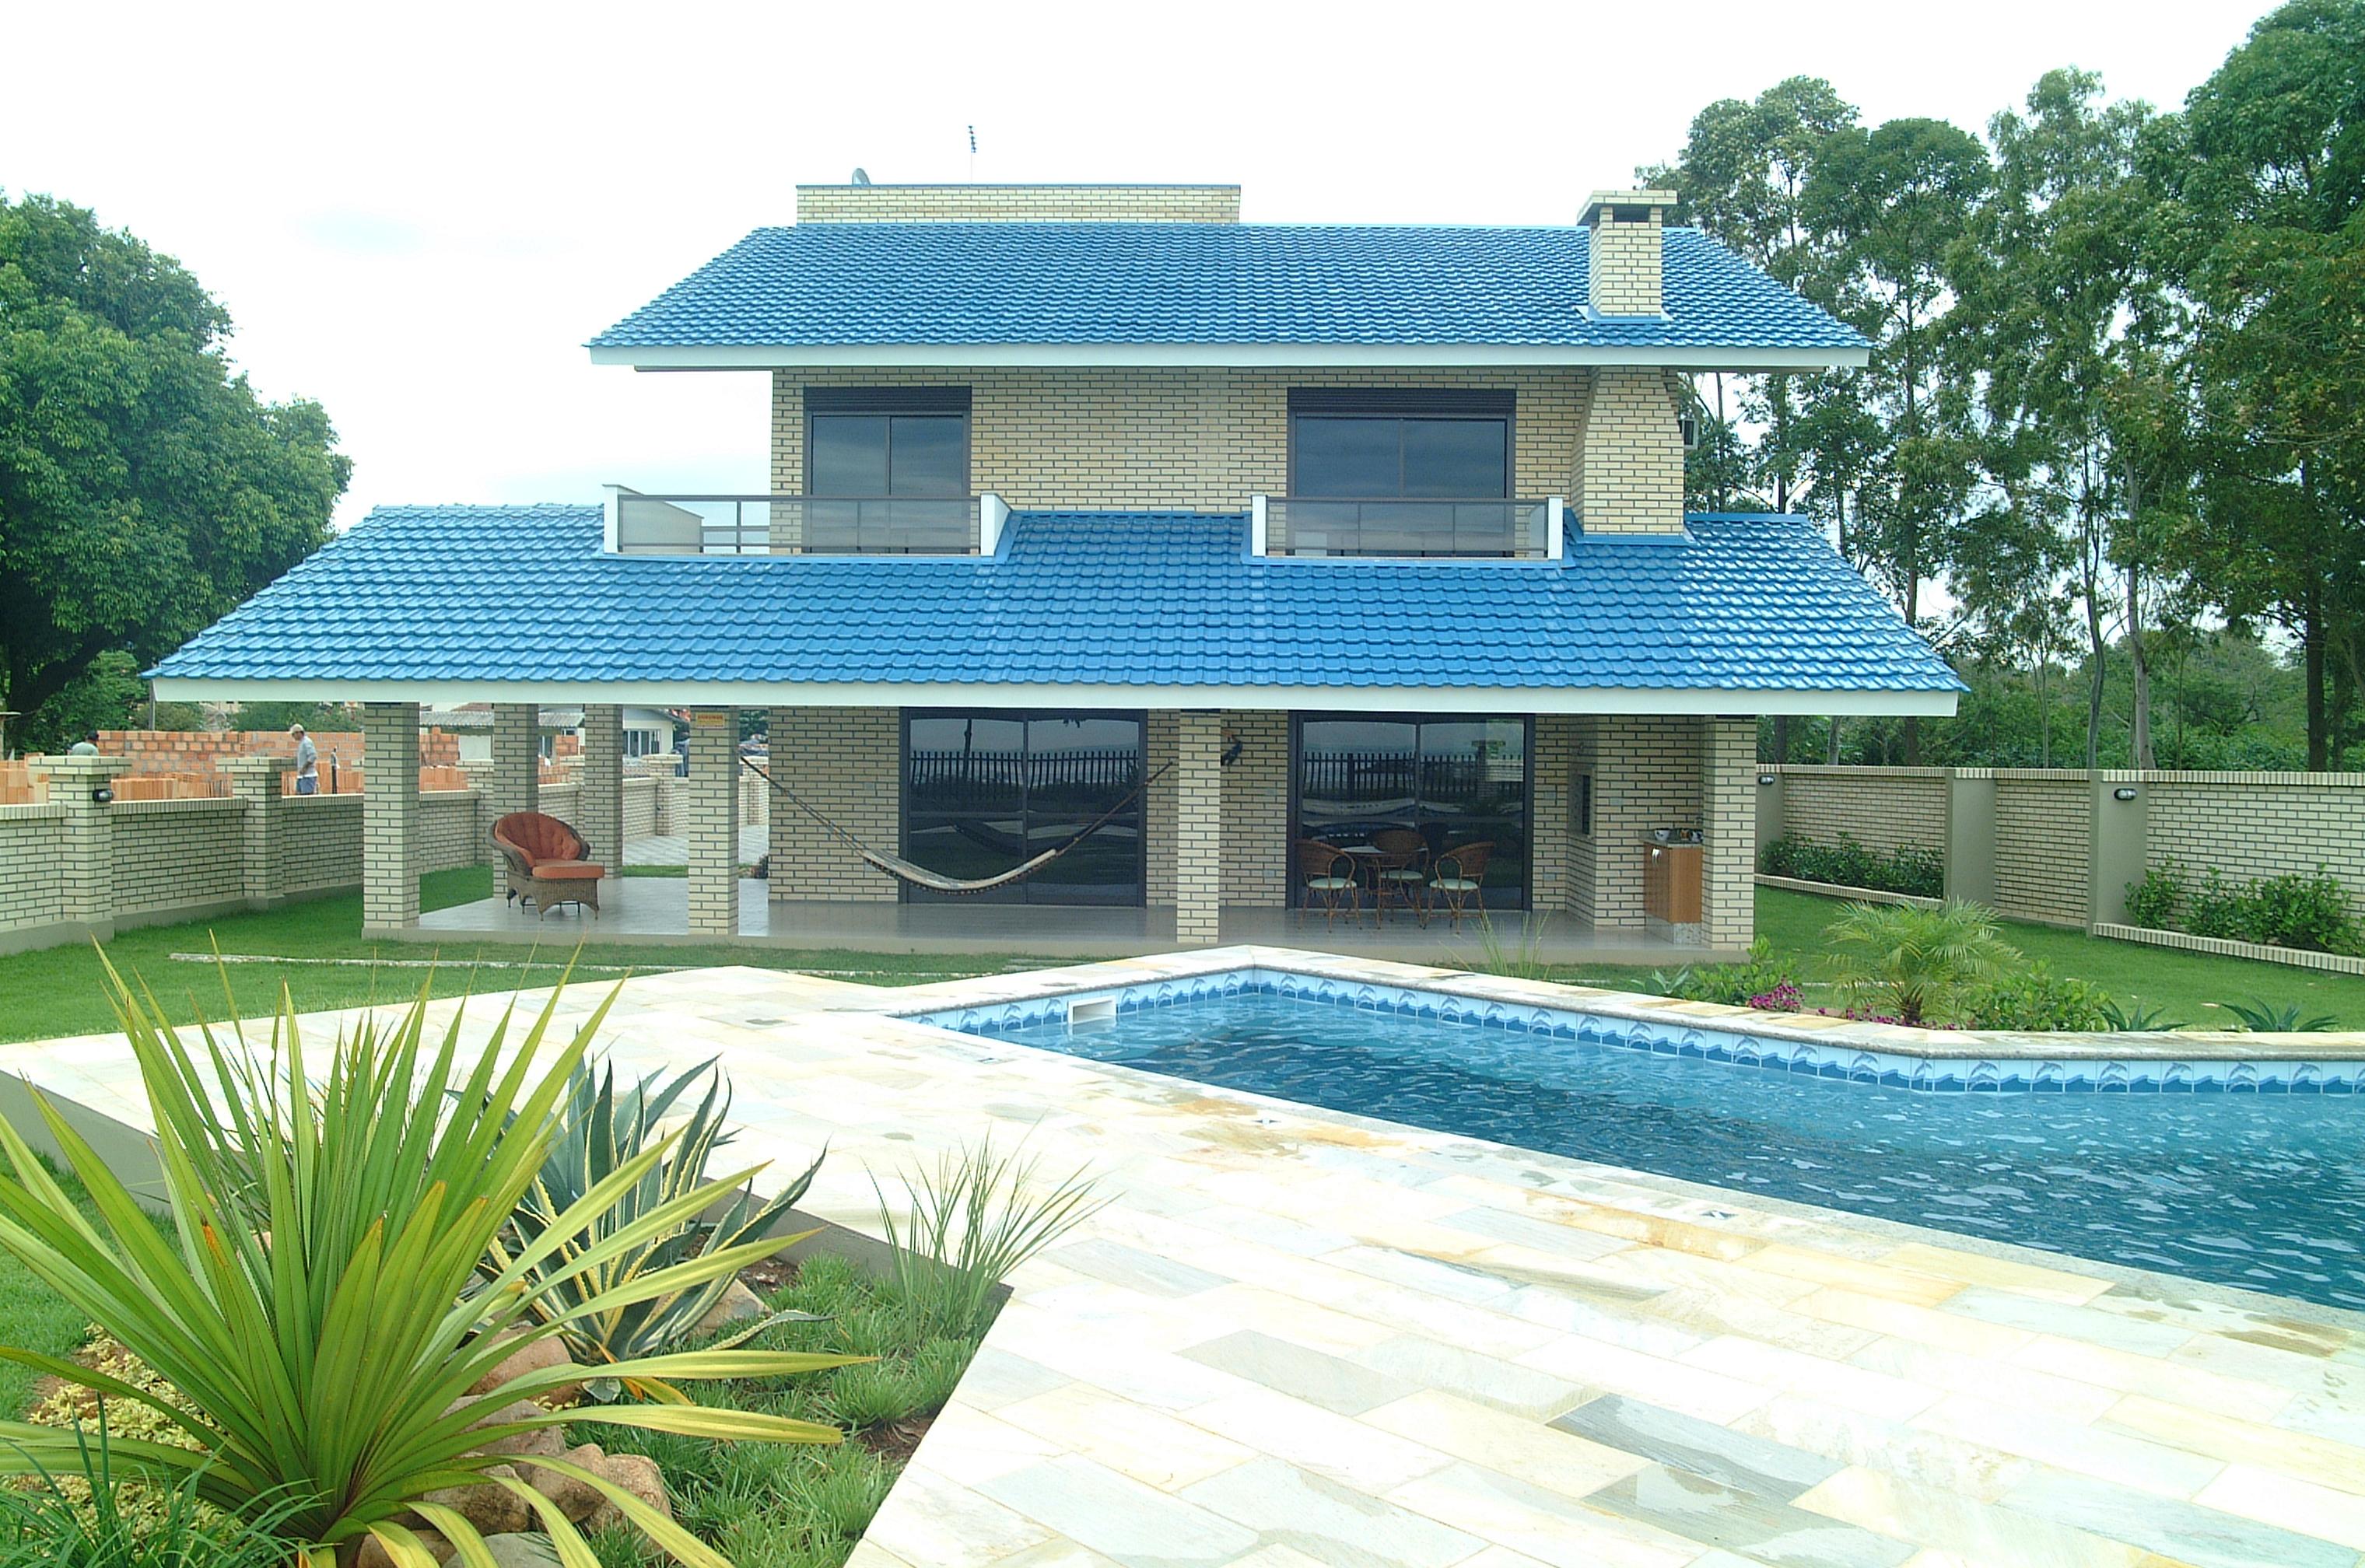 PJV - Casa Teixeira